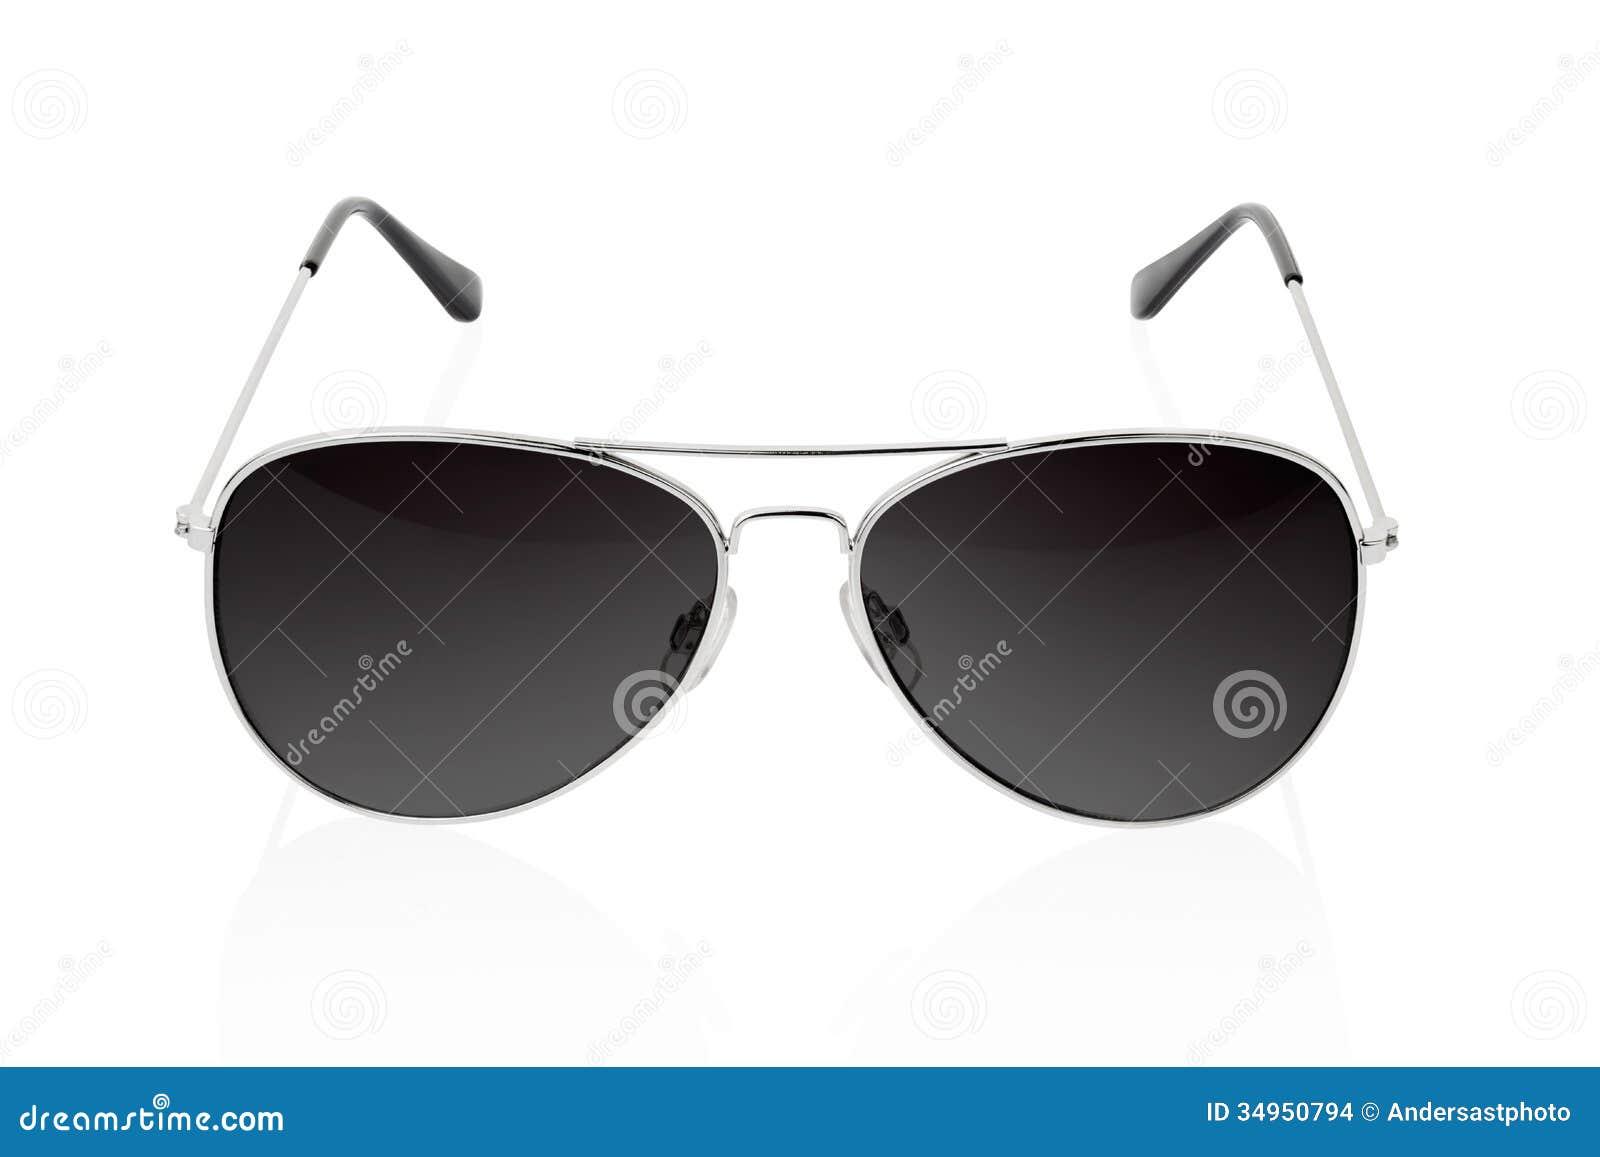 Clip Art Aviator Sunglasses Sunglasses stock images